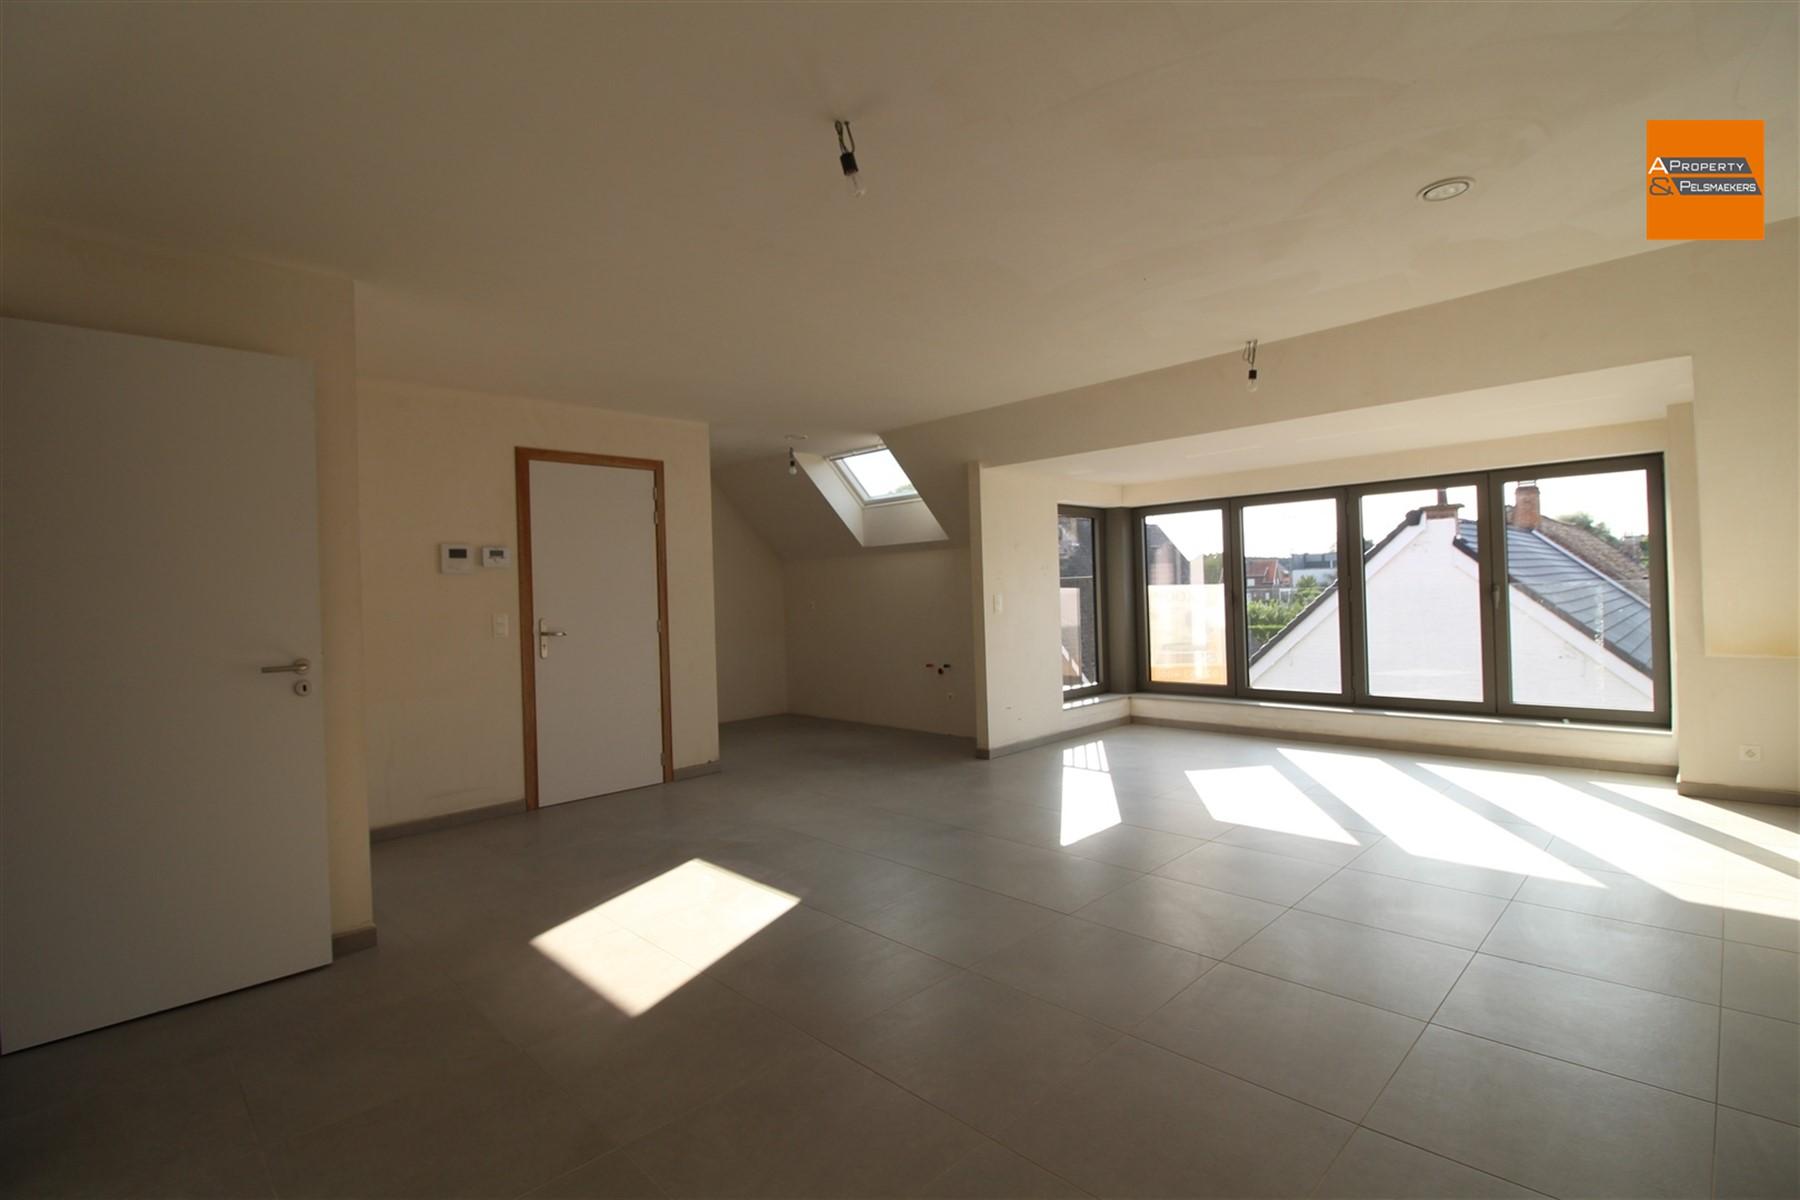 Foto 13 : Appartement in 3060 BERTEM (België) - Prijs € 319.000